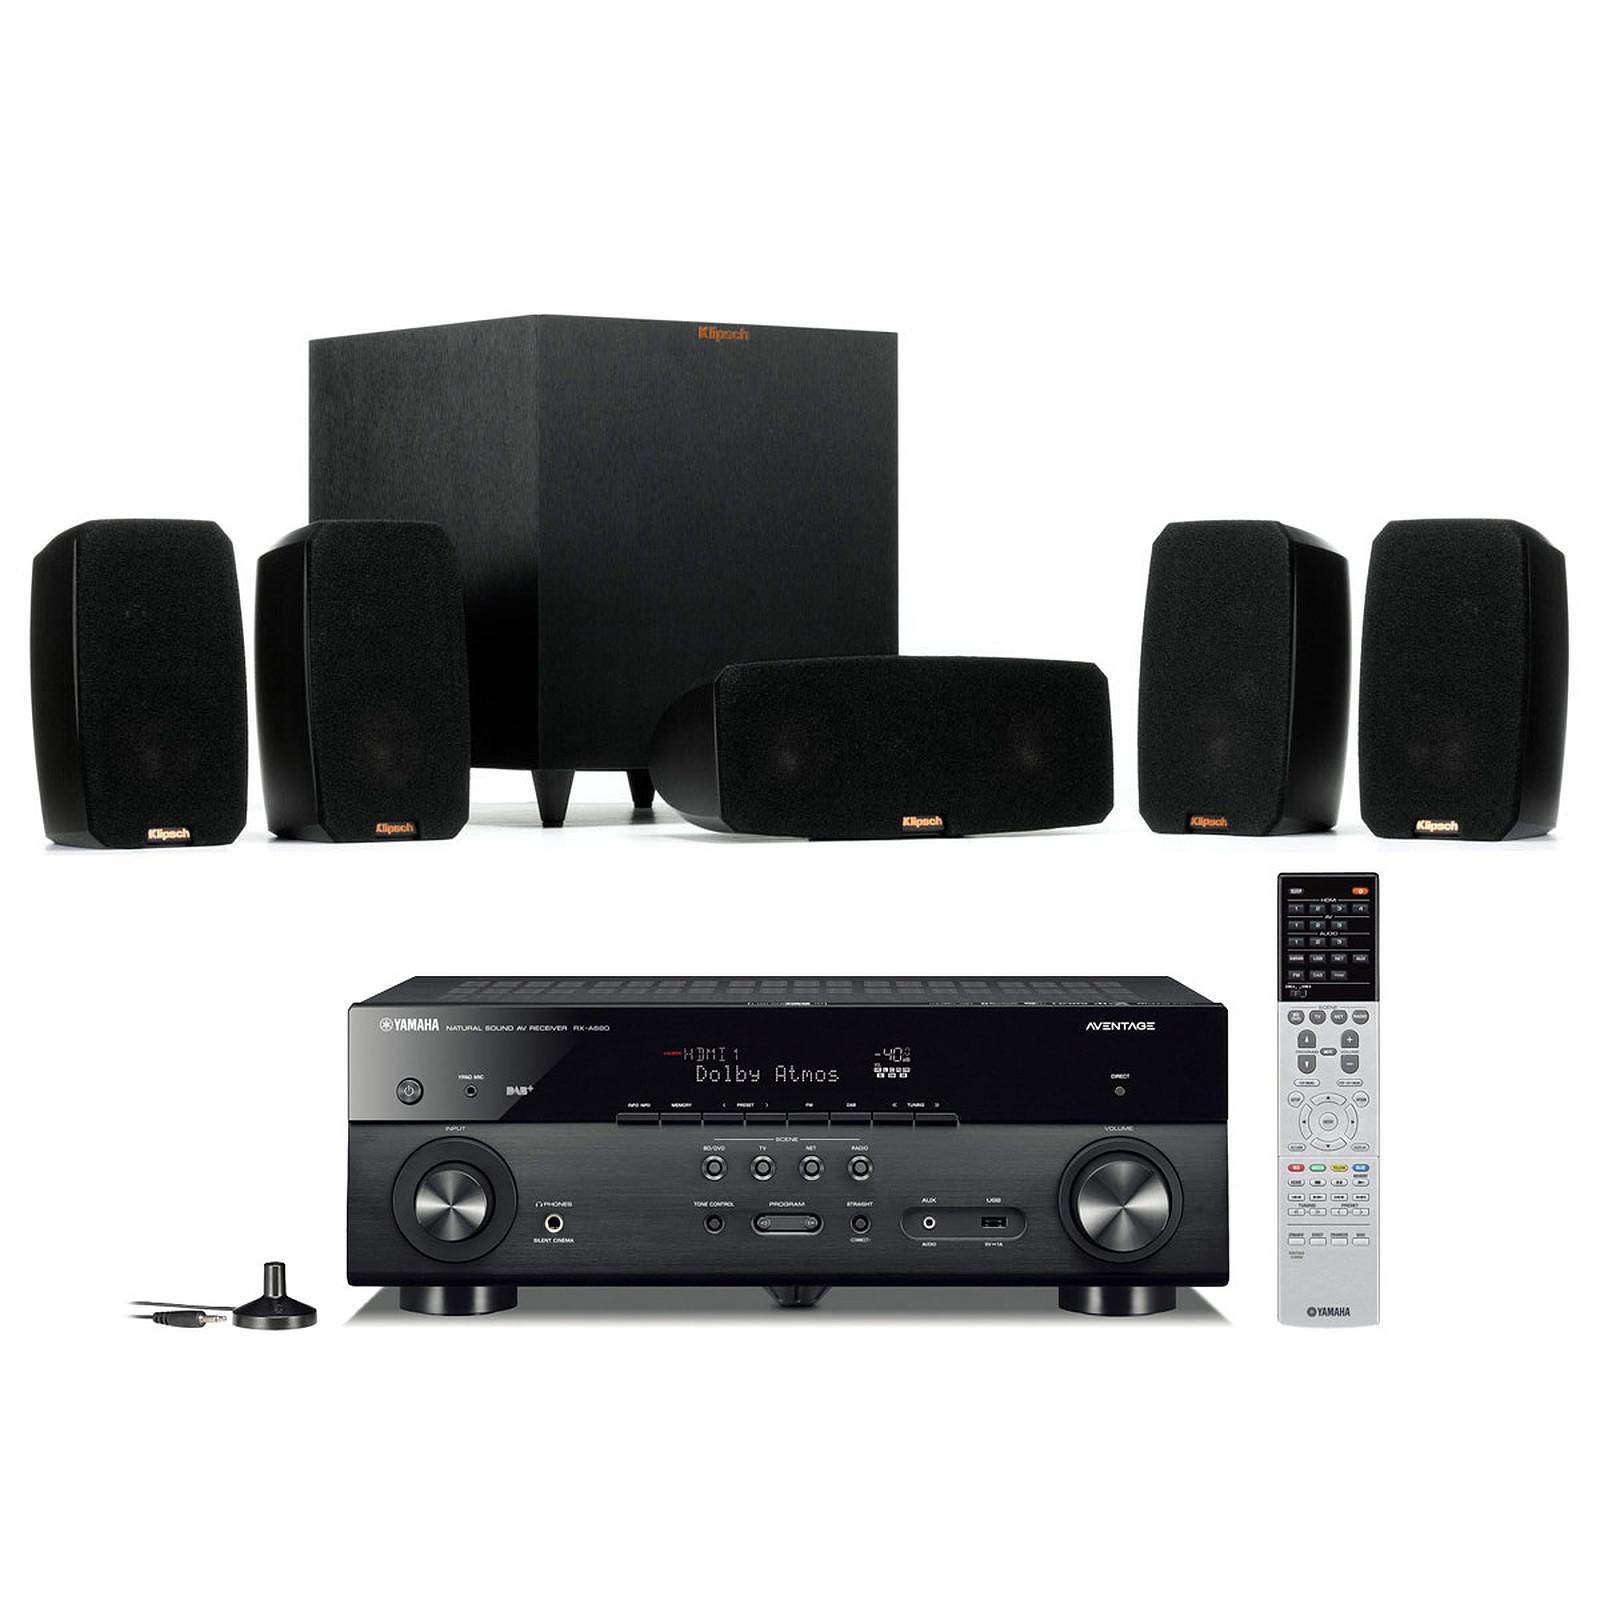 Yamaha MusicCast RX-A680 Noir + Klipsch Reference Theater Pack